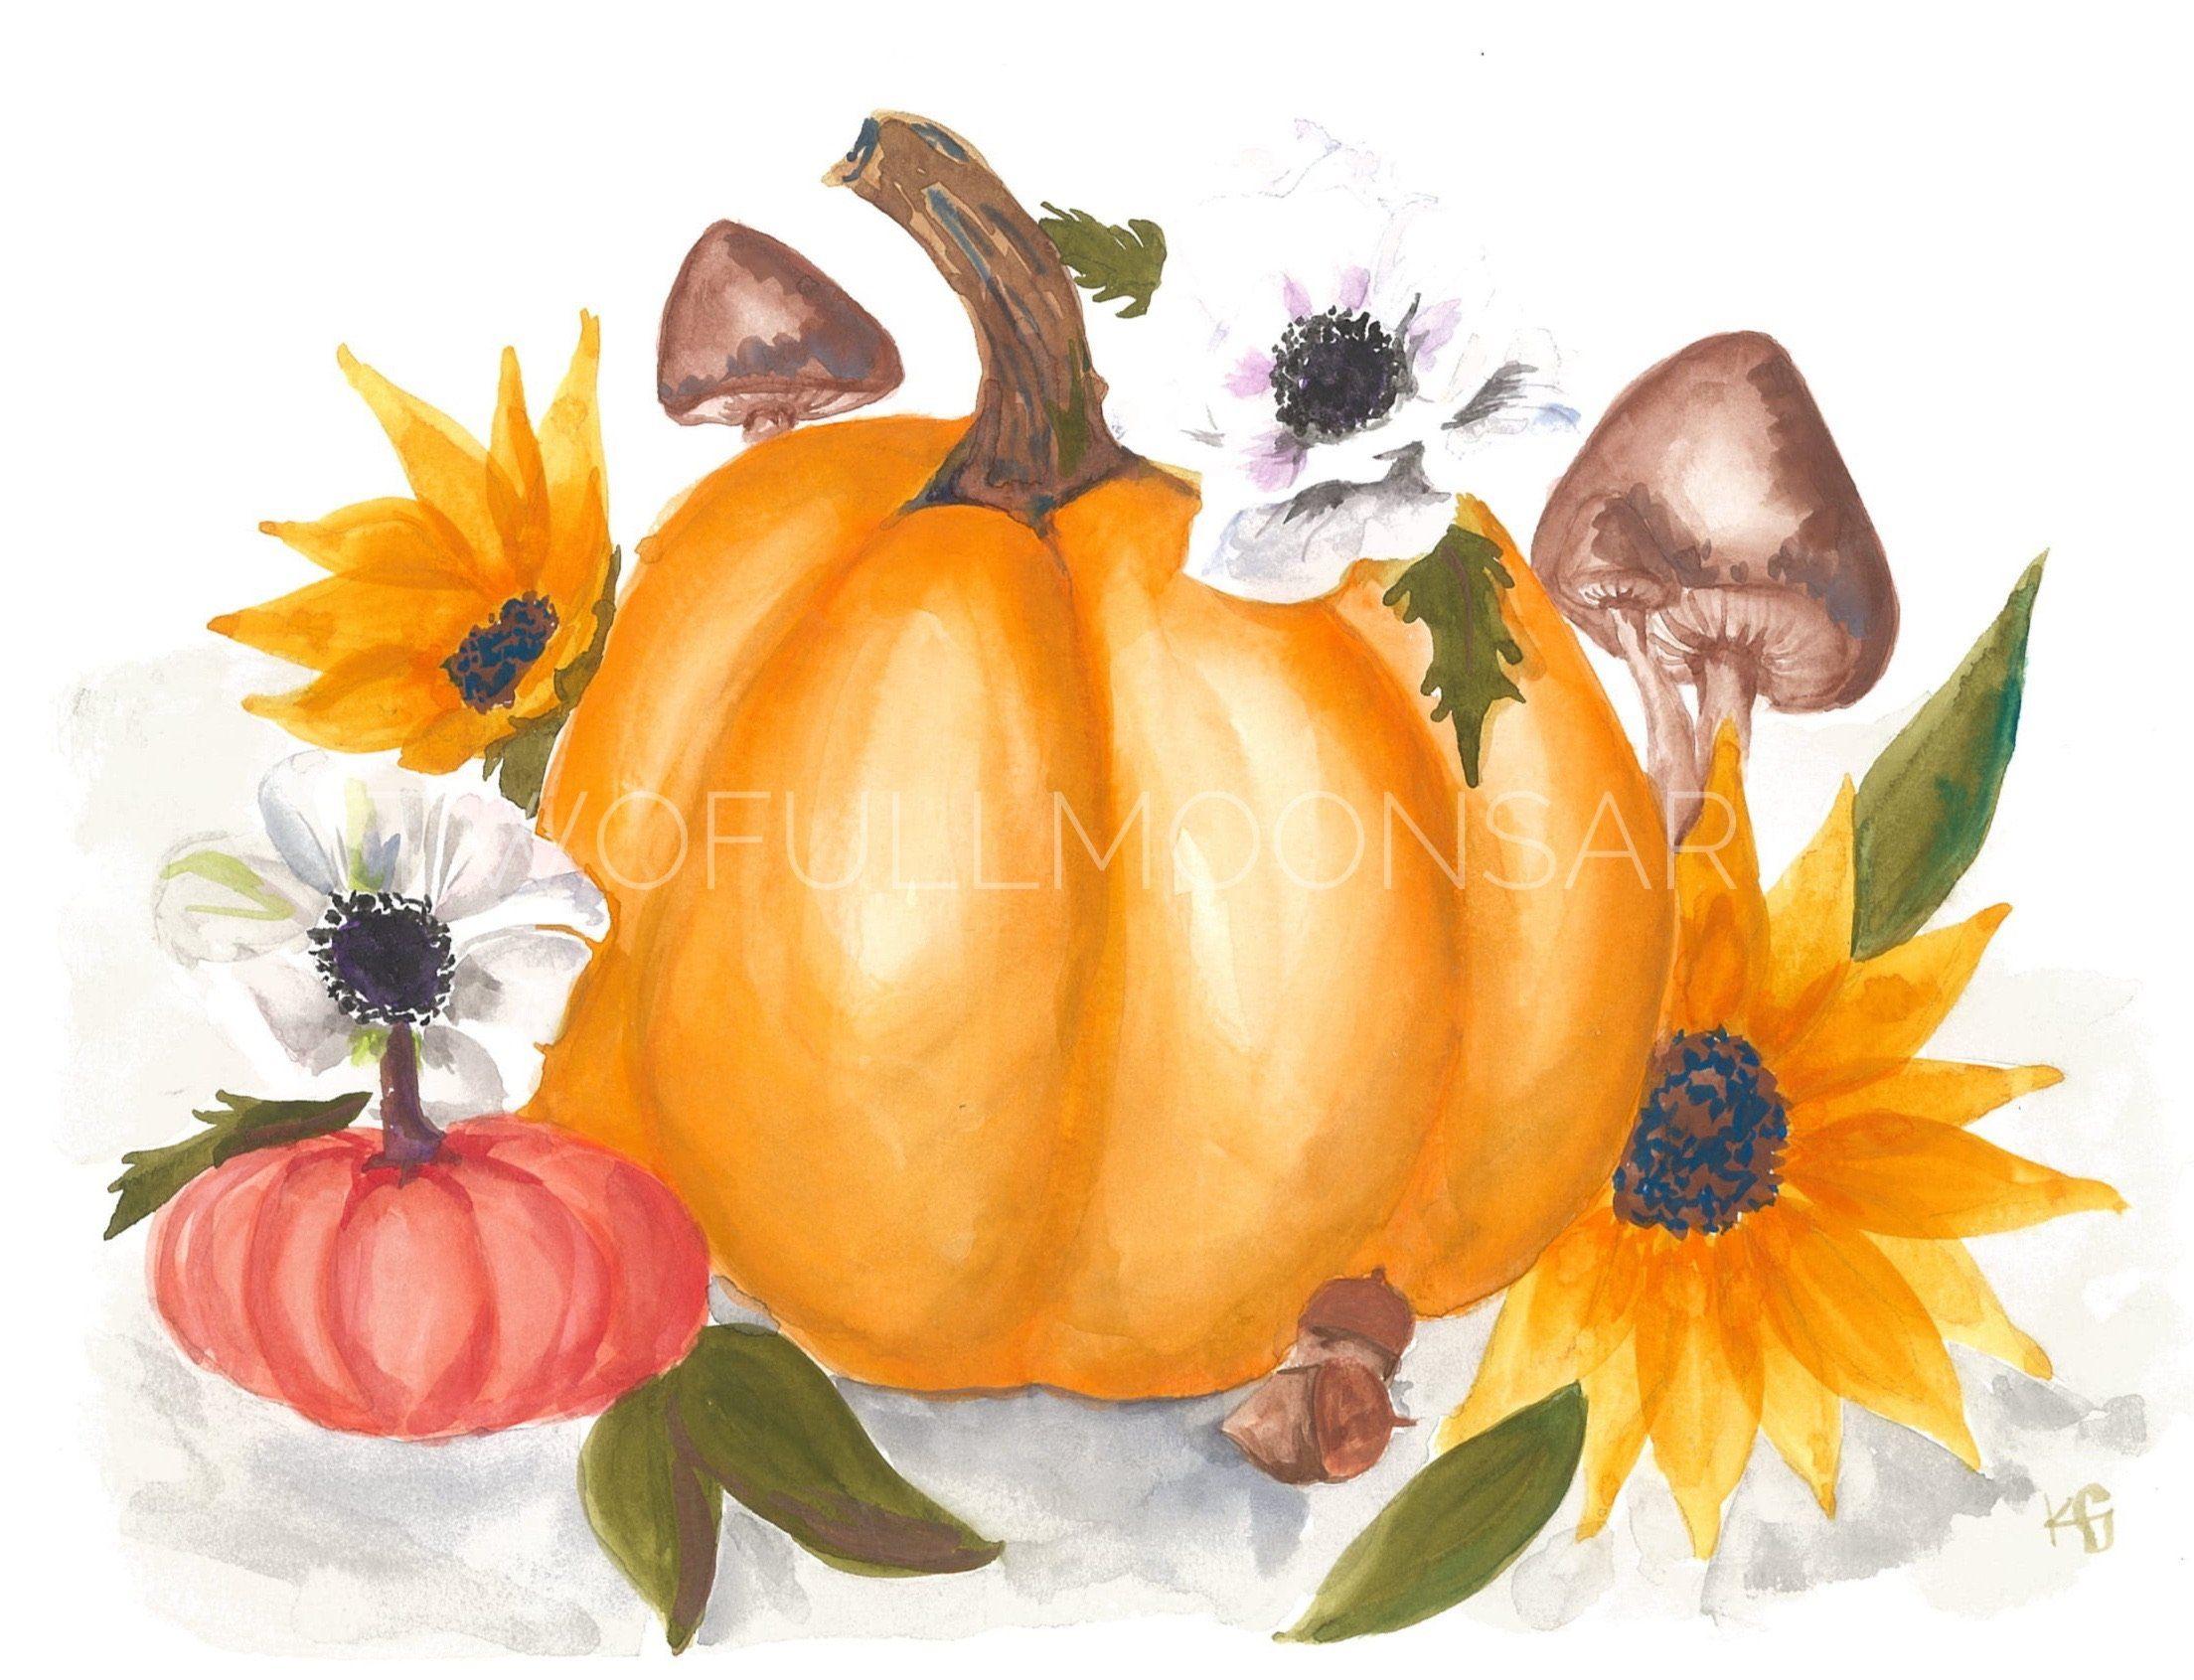 Pumpkins - 5x7